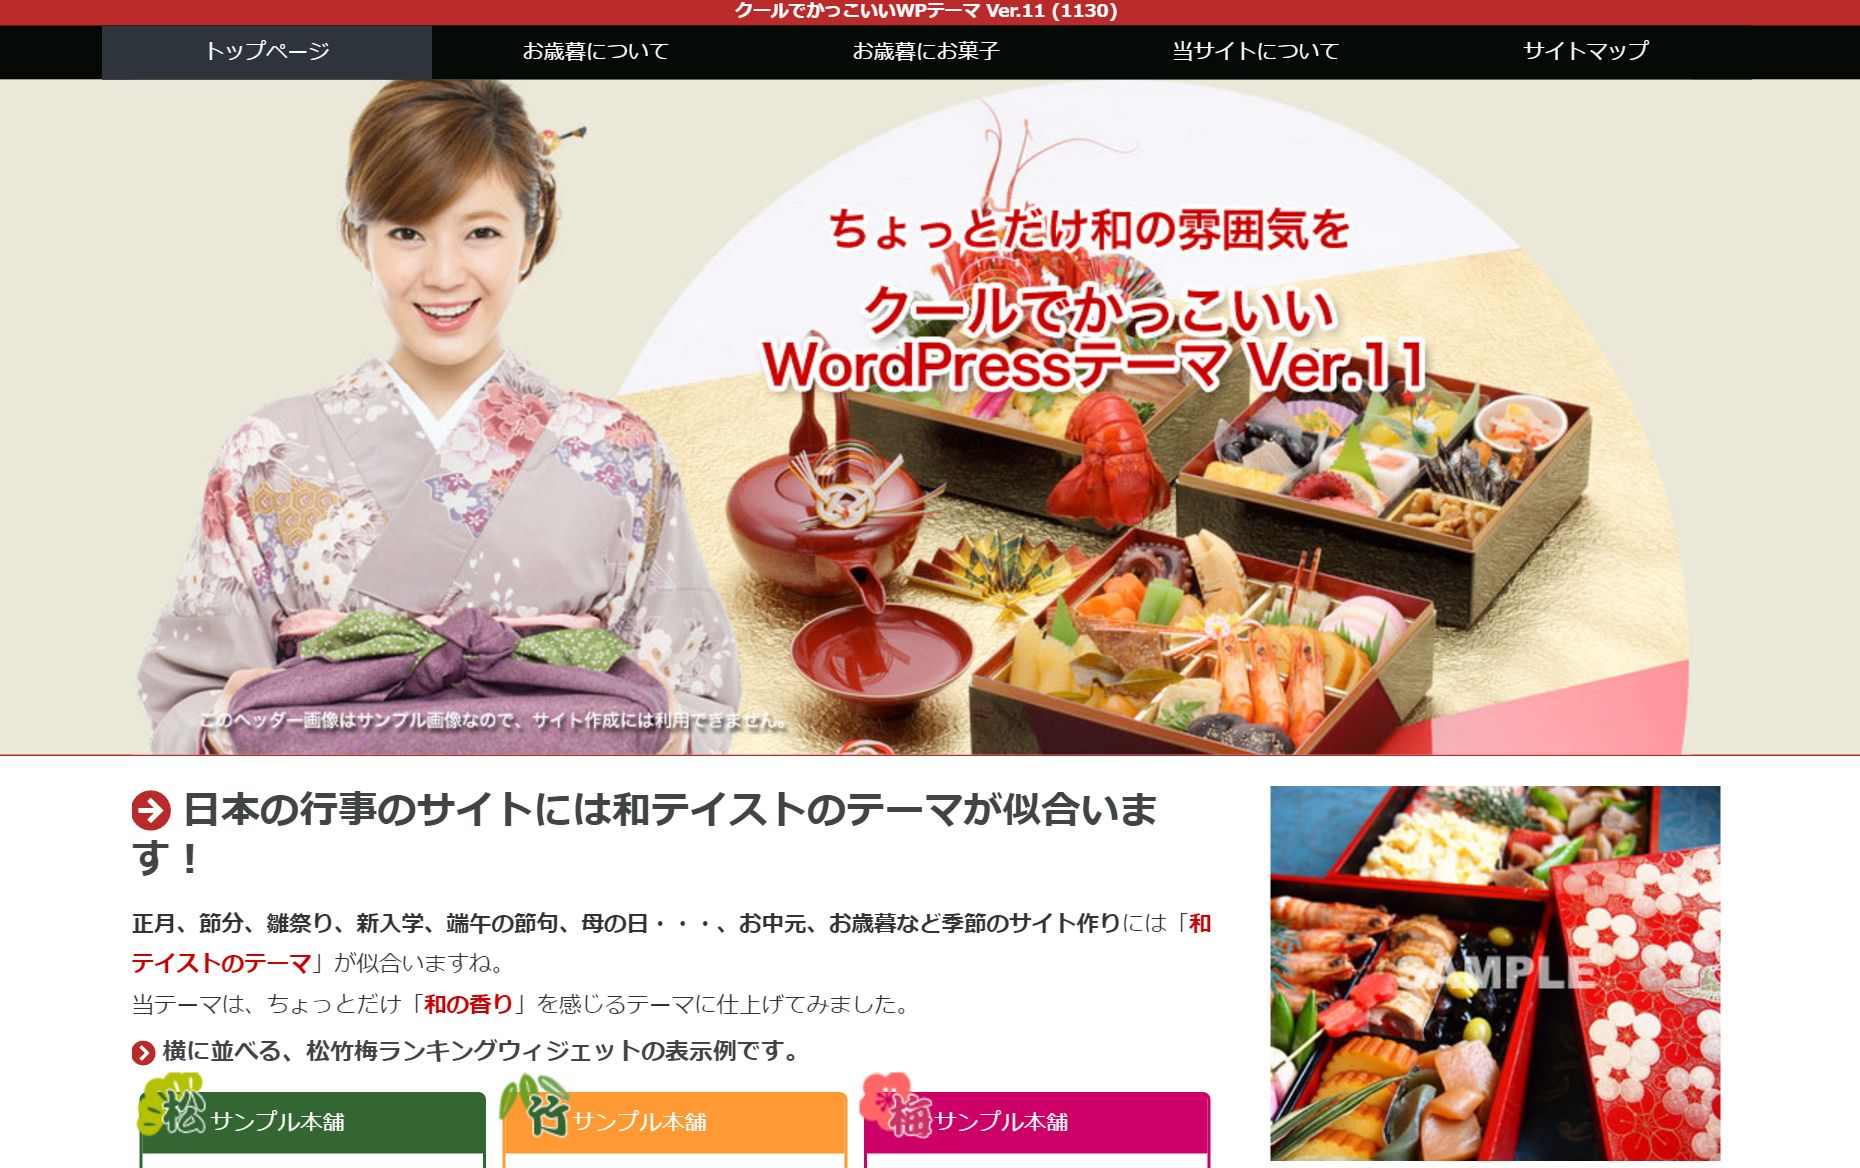 WordPress和風テーマ!クールでかっこいいWordPressテーマ Ver.11